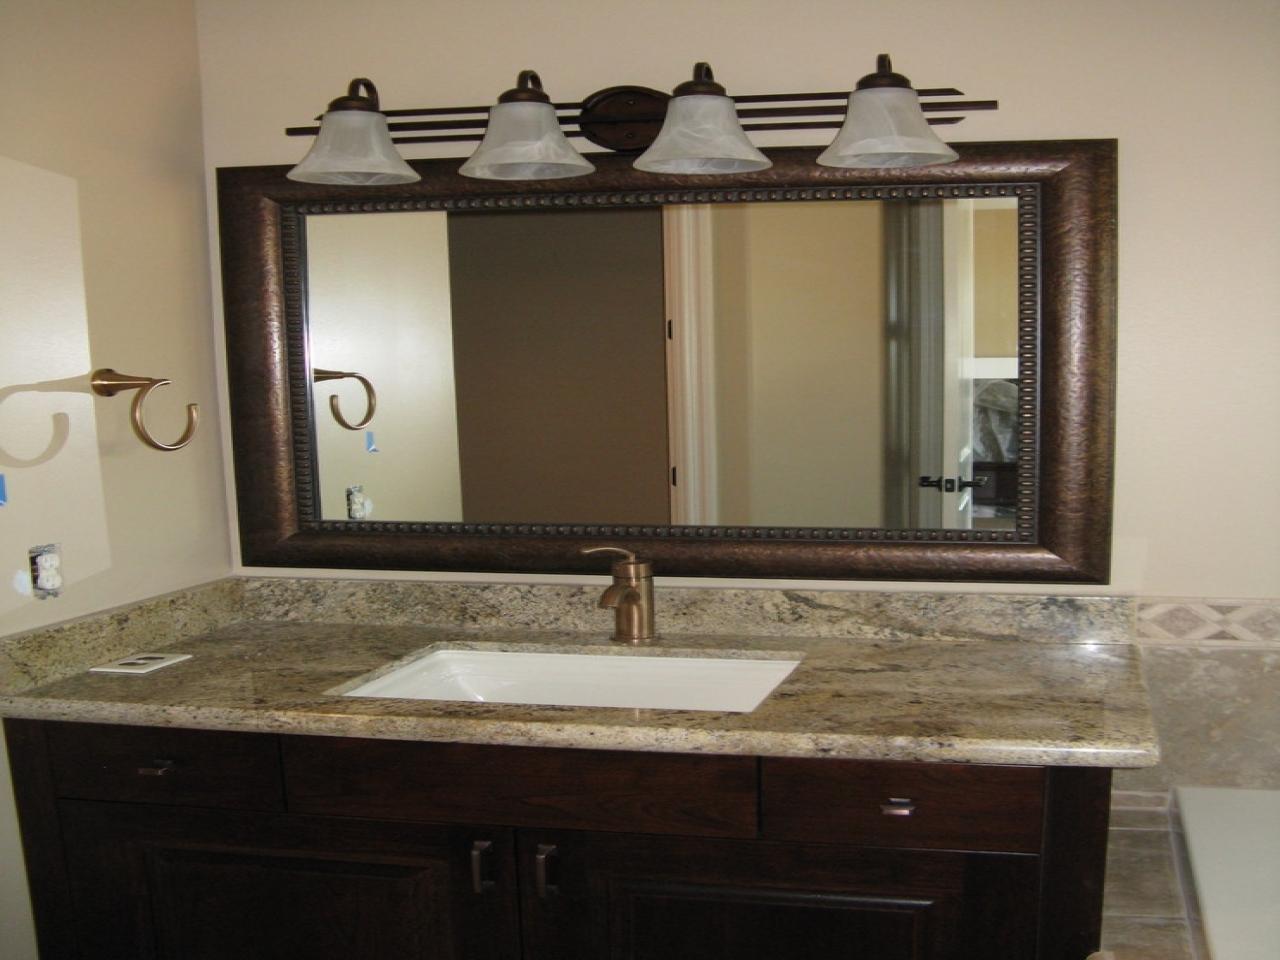 Photos of ... Size 1280x960 Framed Bathroom Vanity Mirrors Nassat Bathroom Framed  Bathroom framed bathroom vanity mirrors